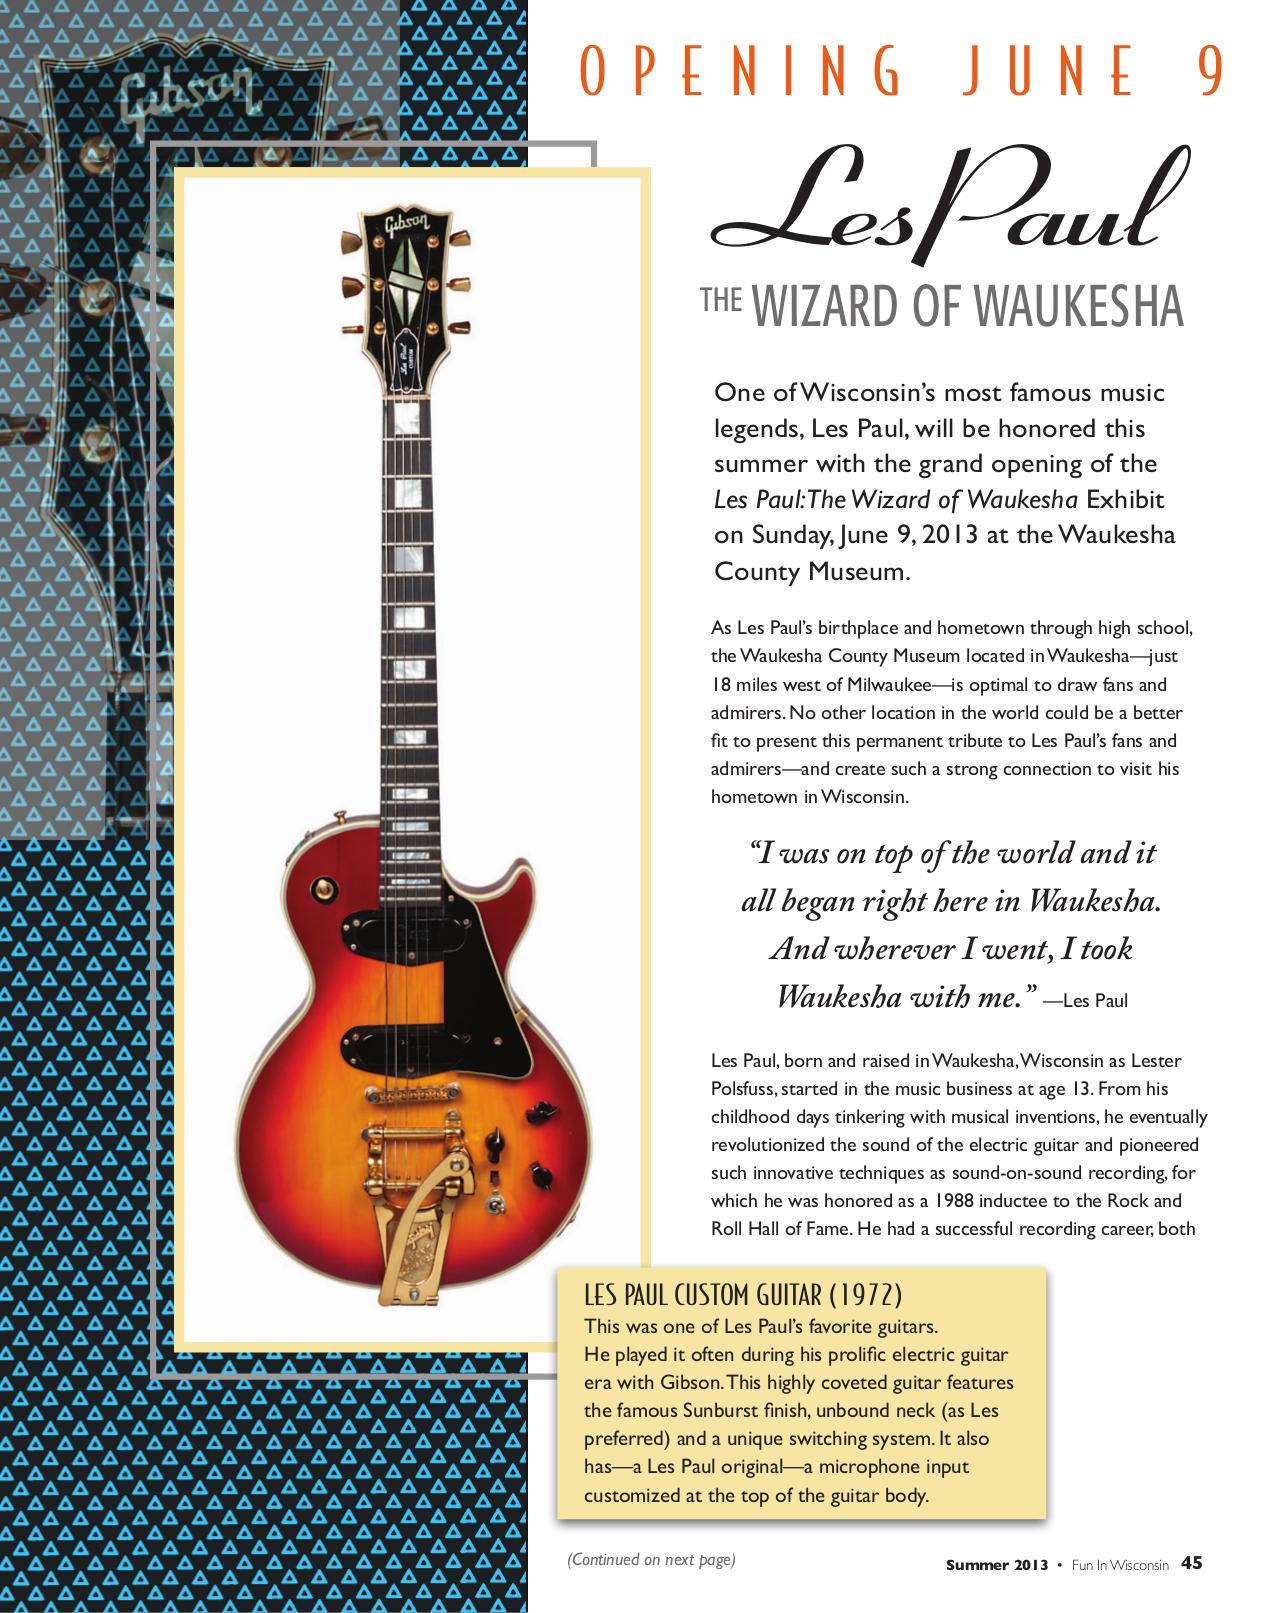 ibanez js wiring diagram ibanez image wiring pdf for ibanez joe satriani series js2400 guitar manual on ibanez js2400 wiring diagram